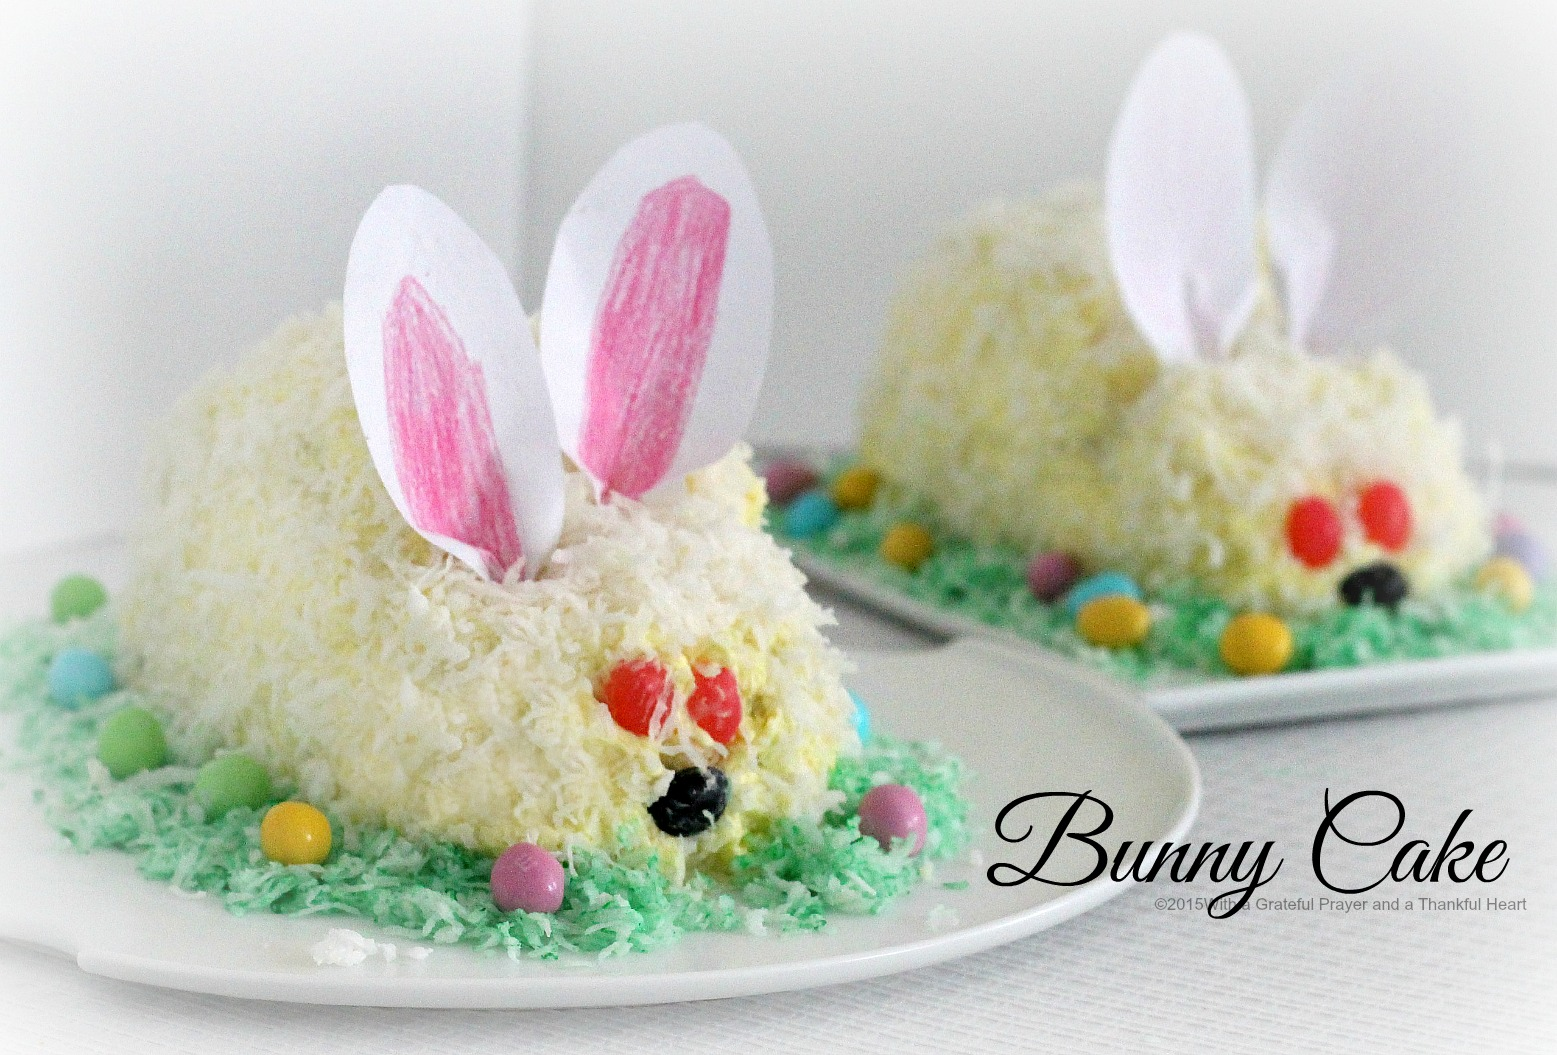 Easter Bunny Cake Grateful Prayer Thankful Heart